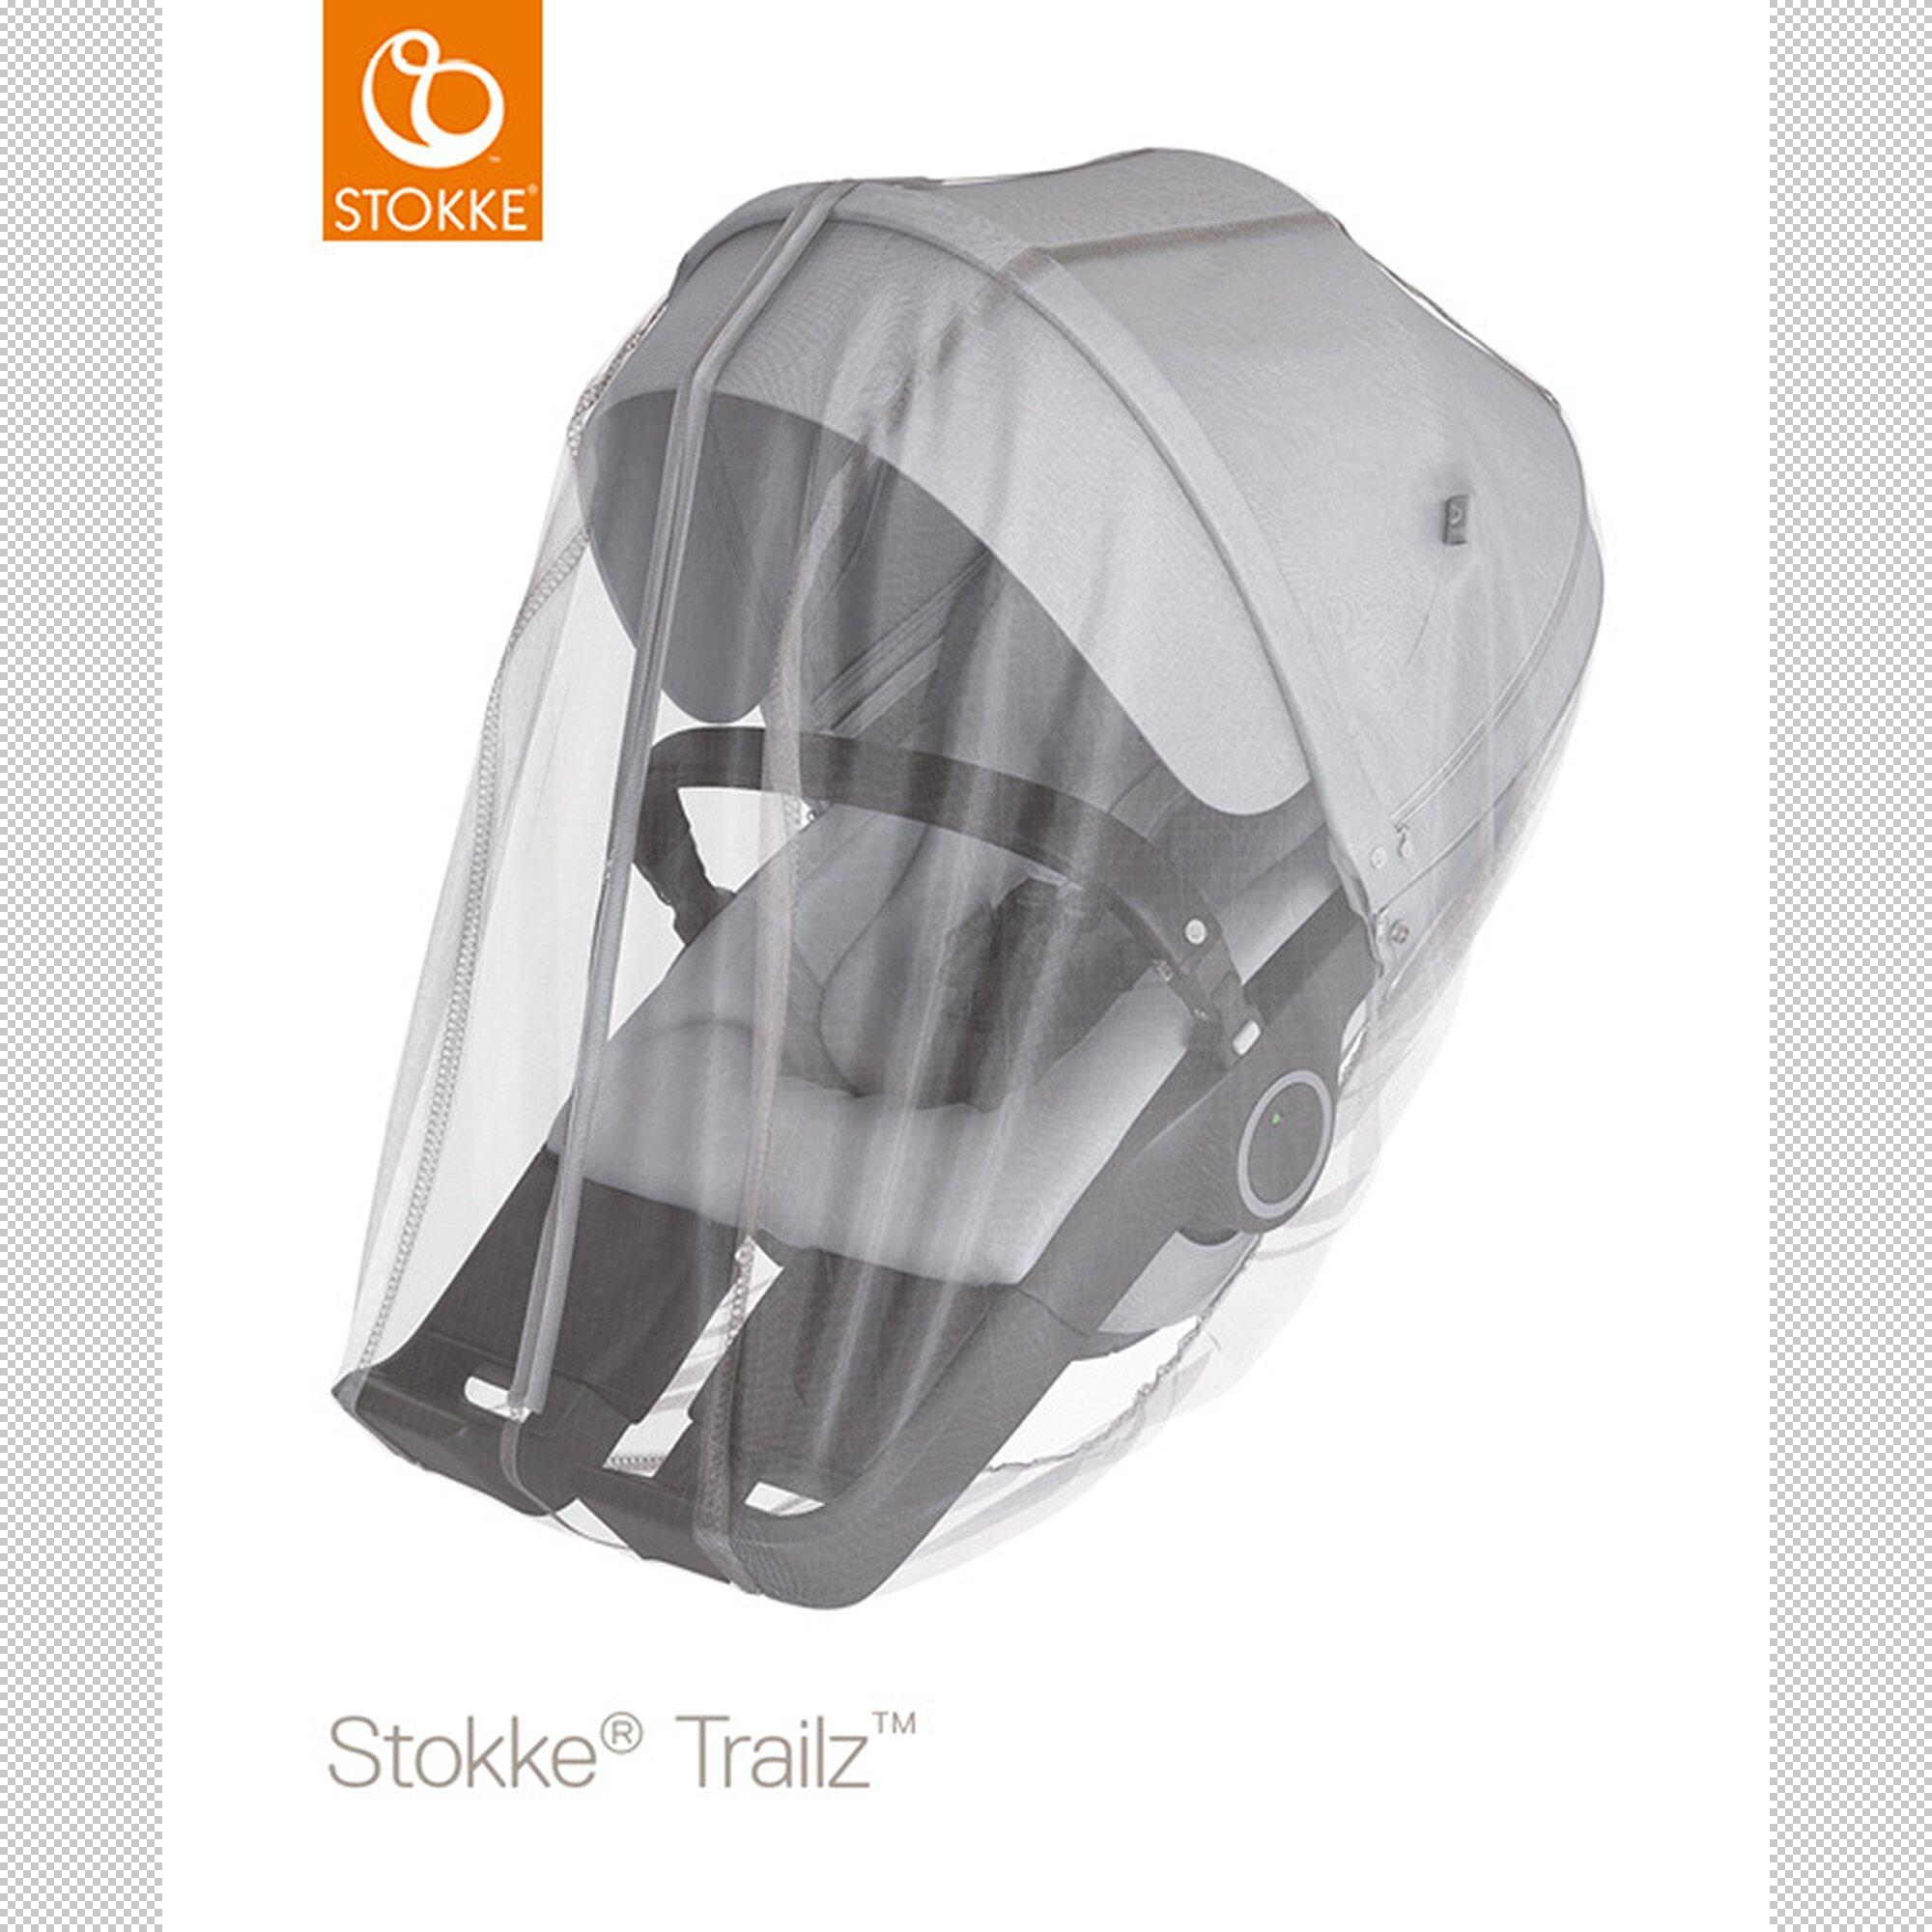 stokke-insektenschutz-fur-xplory-v6-trailz-beige